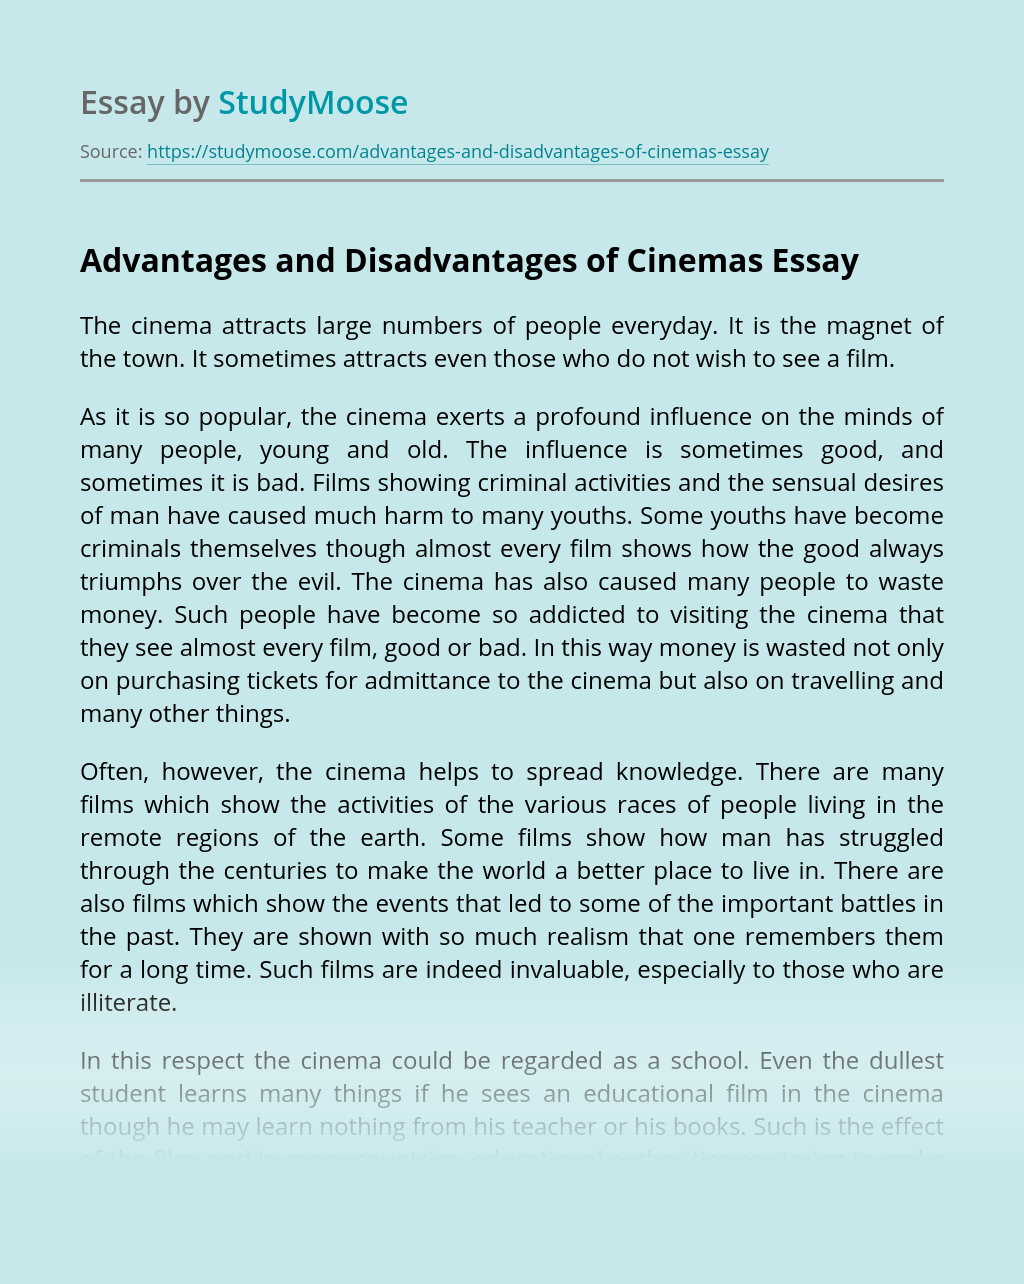 Advantages and Disadvantages of Cinemas